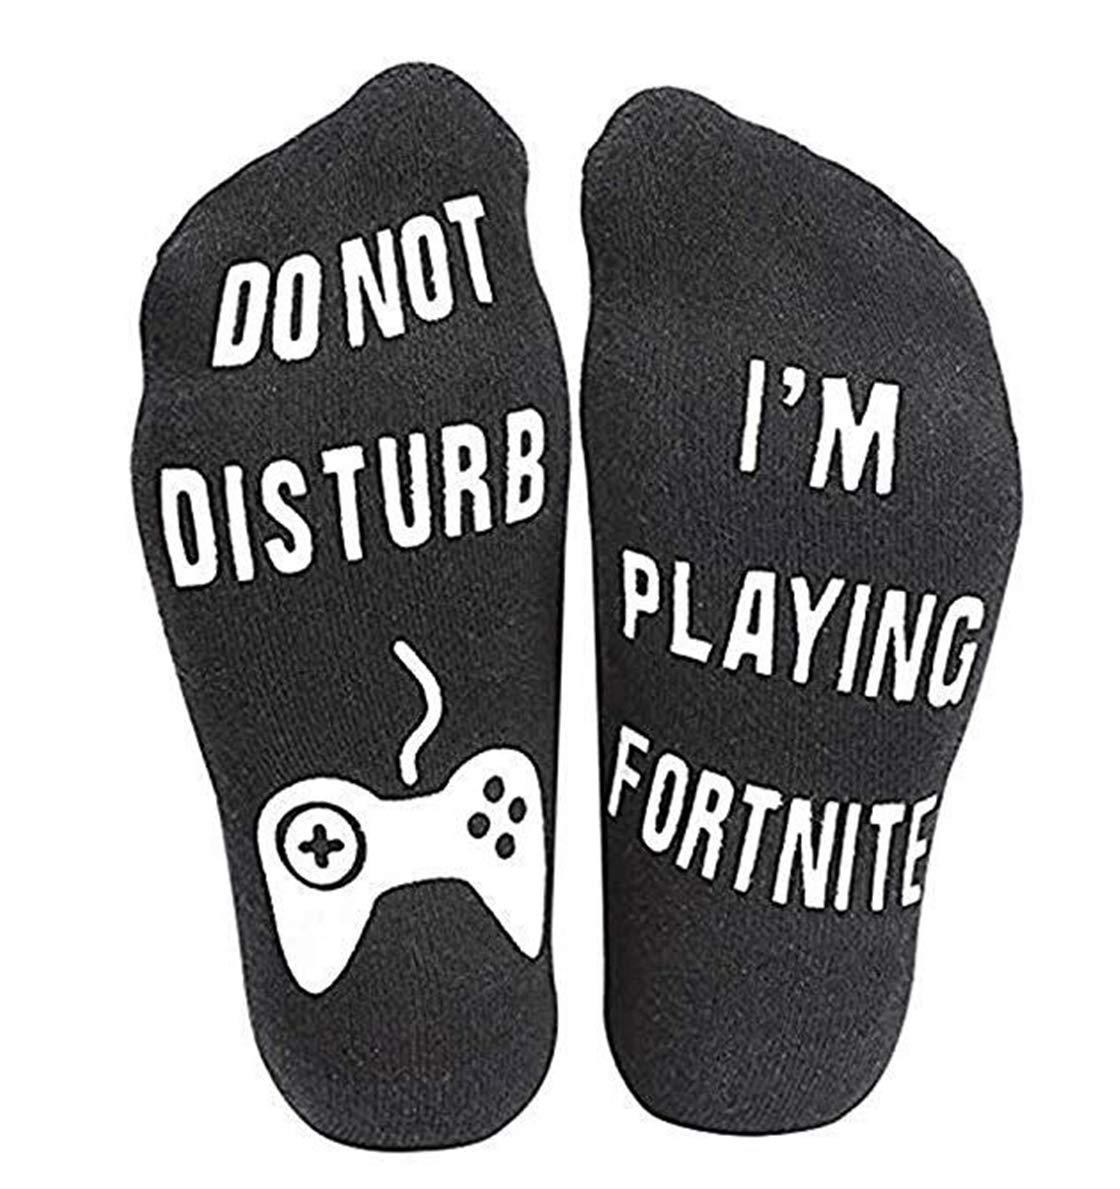 Heyuni.1pair DO NOT Disturb I AM Playing FORTNITE Casual Fashionable Socks, A1